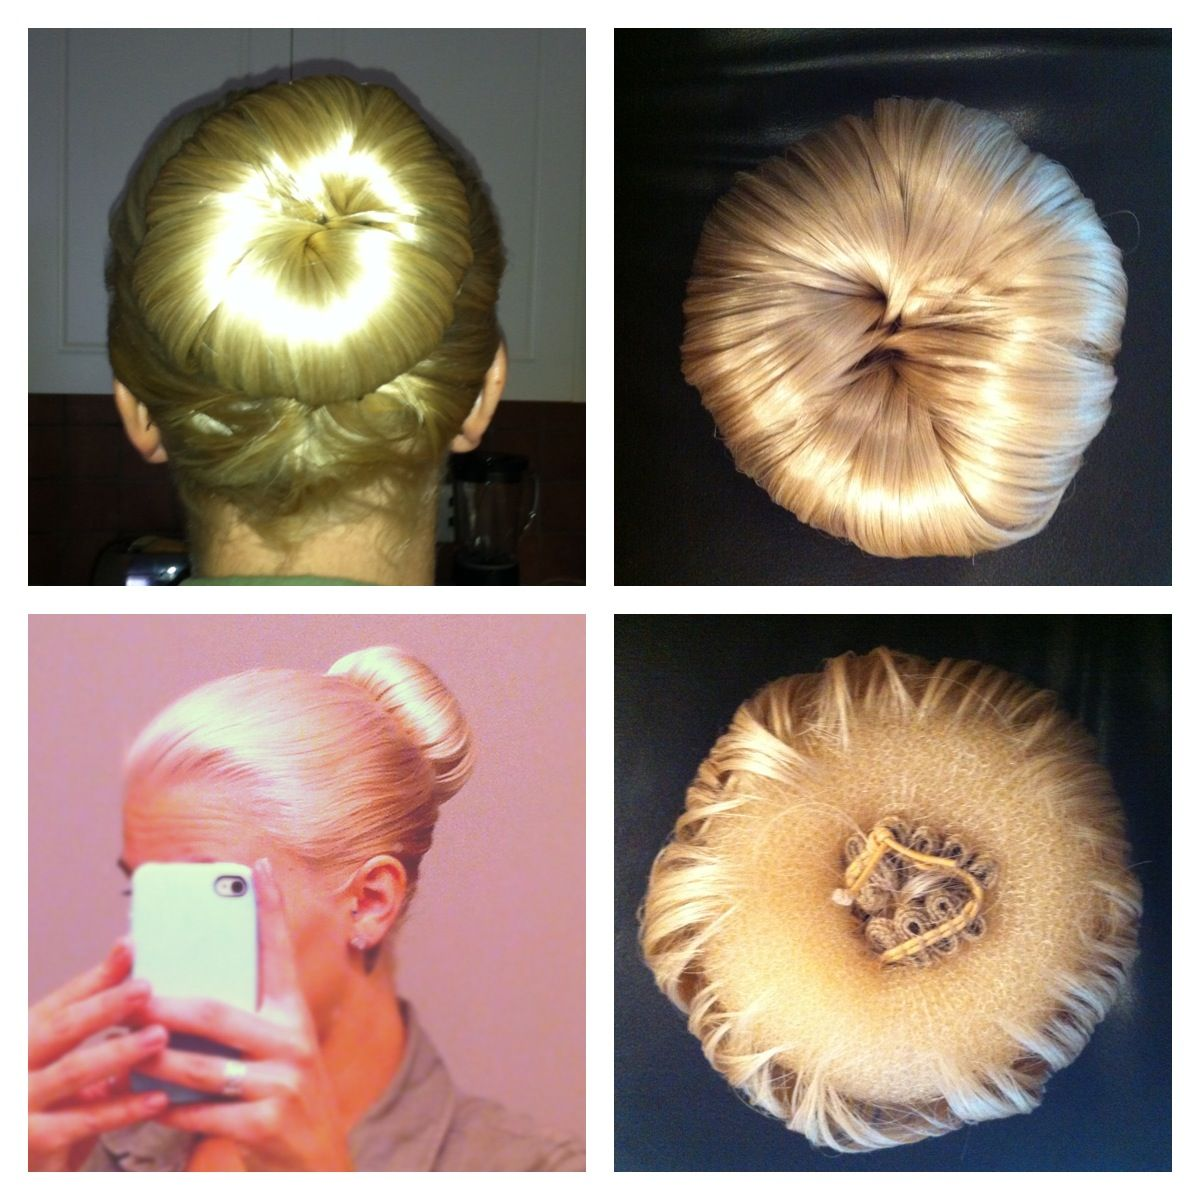 Pin By Marcie Bowling On Beauty Stuff Short Hair Bun Fake Hair Buns Dance Hairstyles